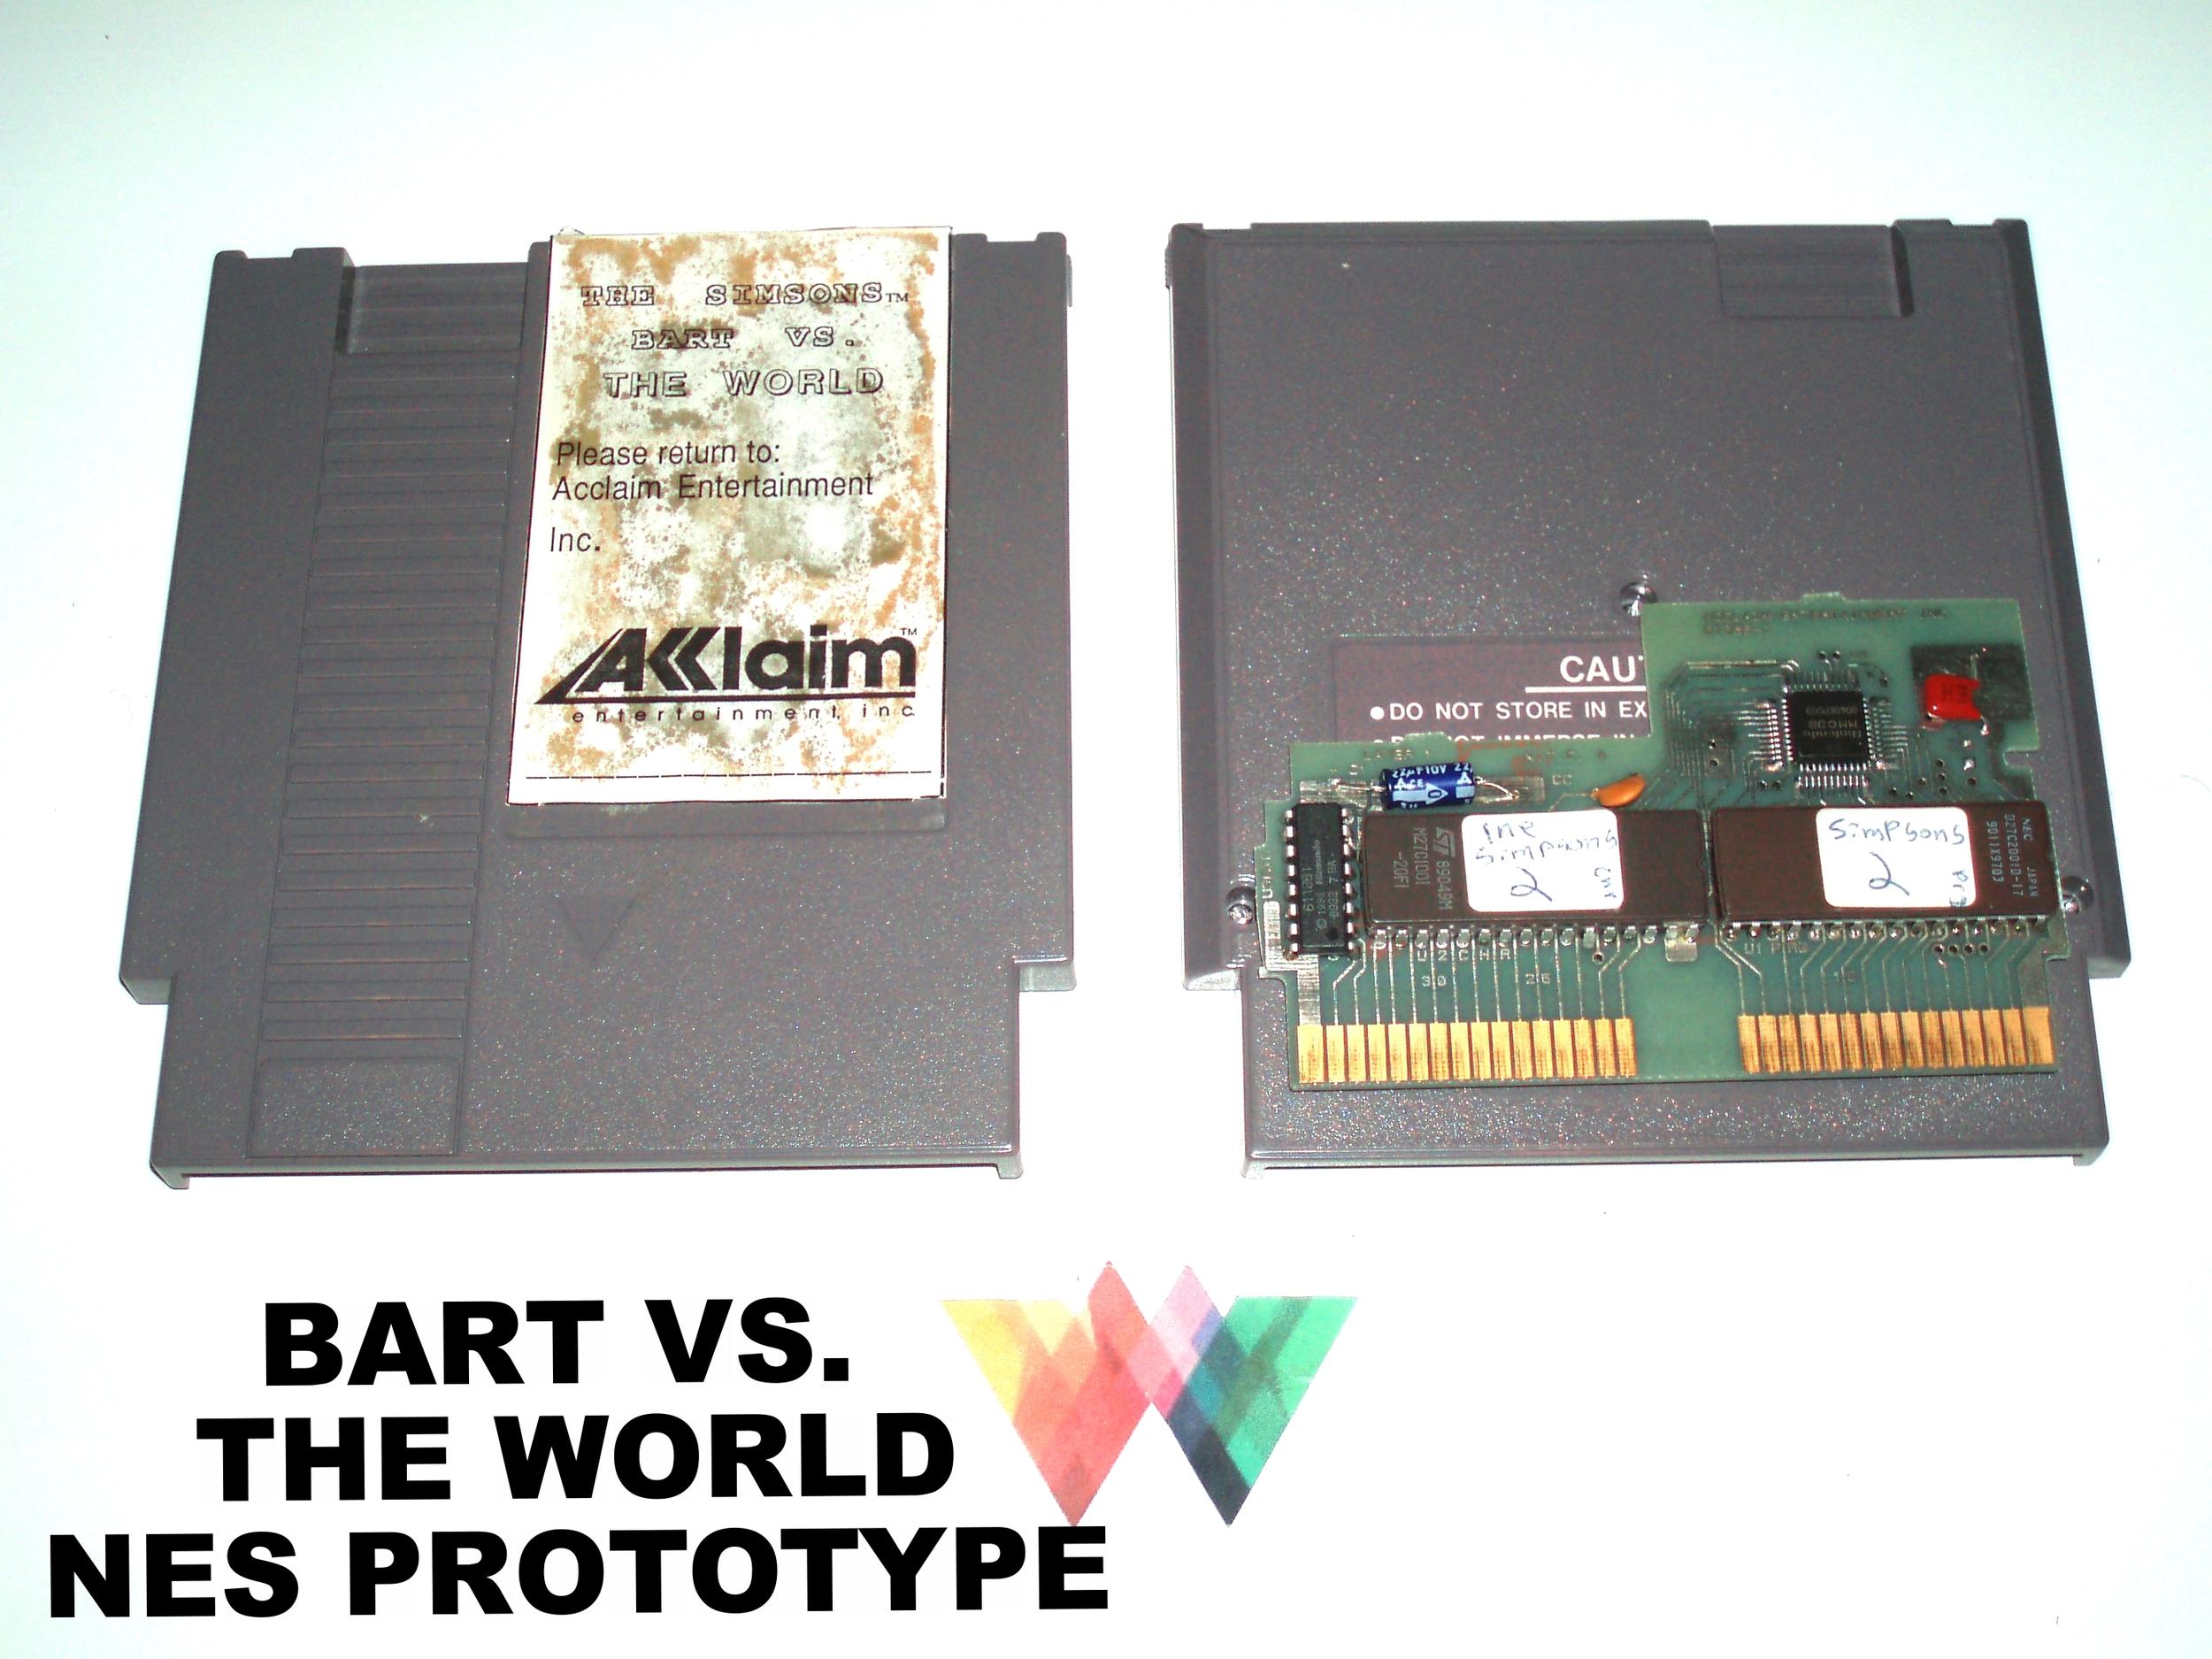 Bart Vs. The World Prototype